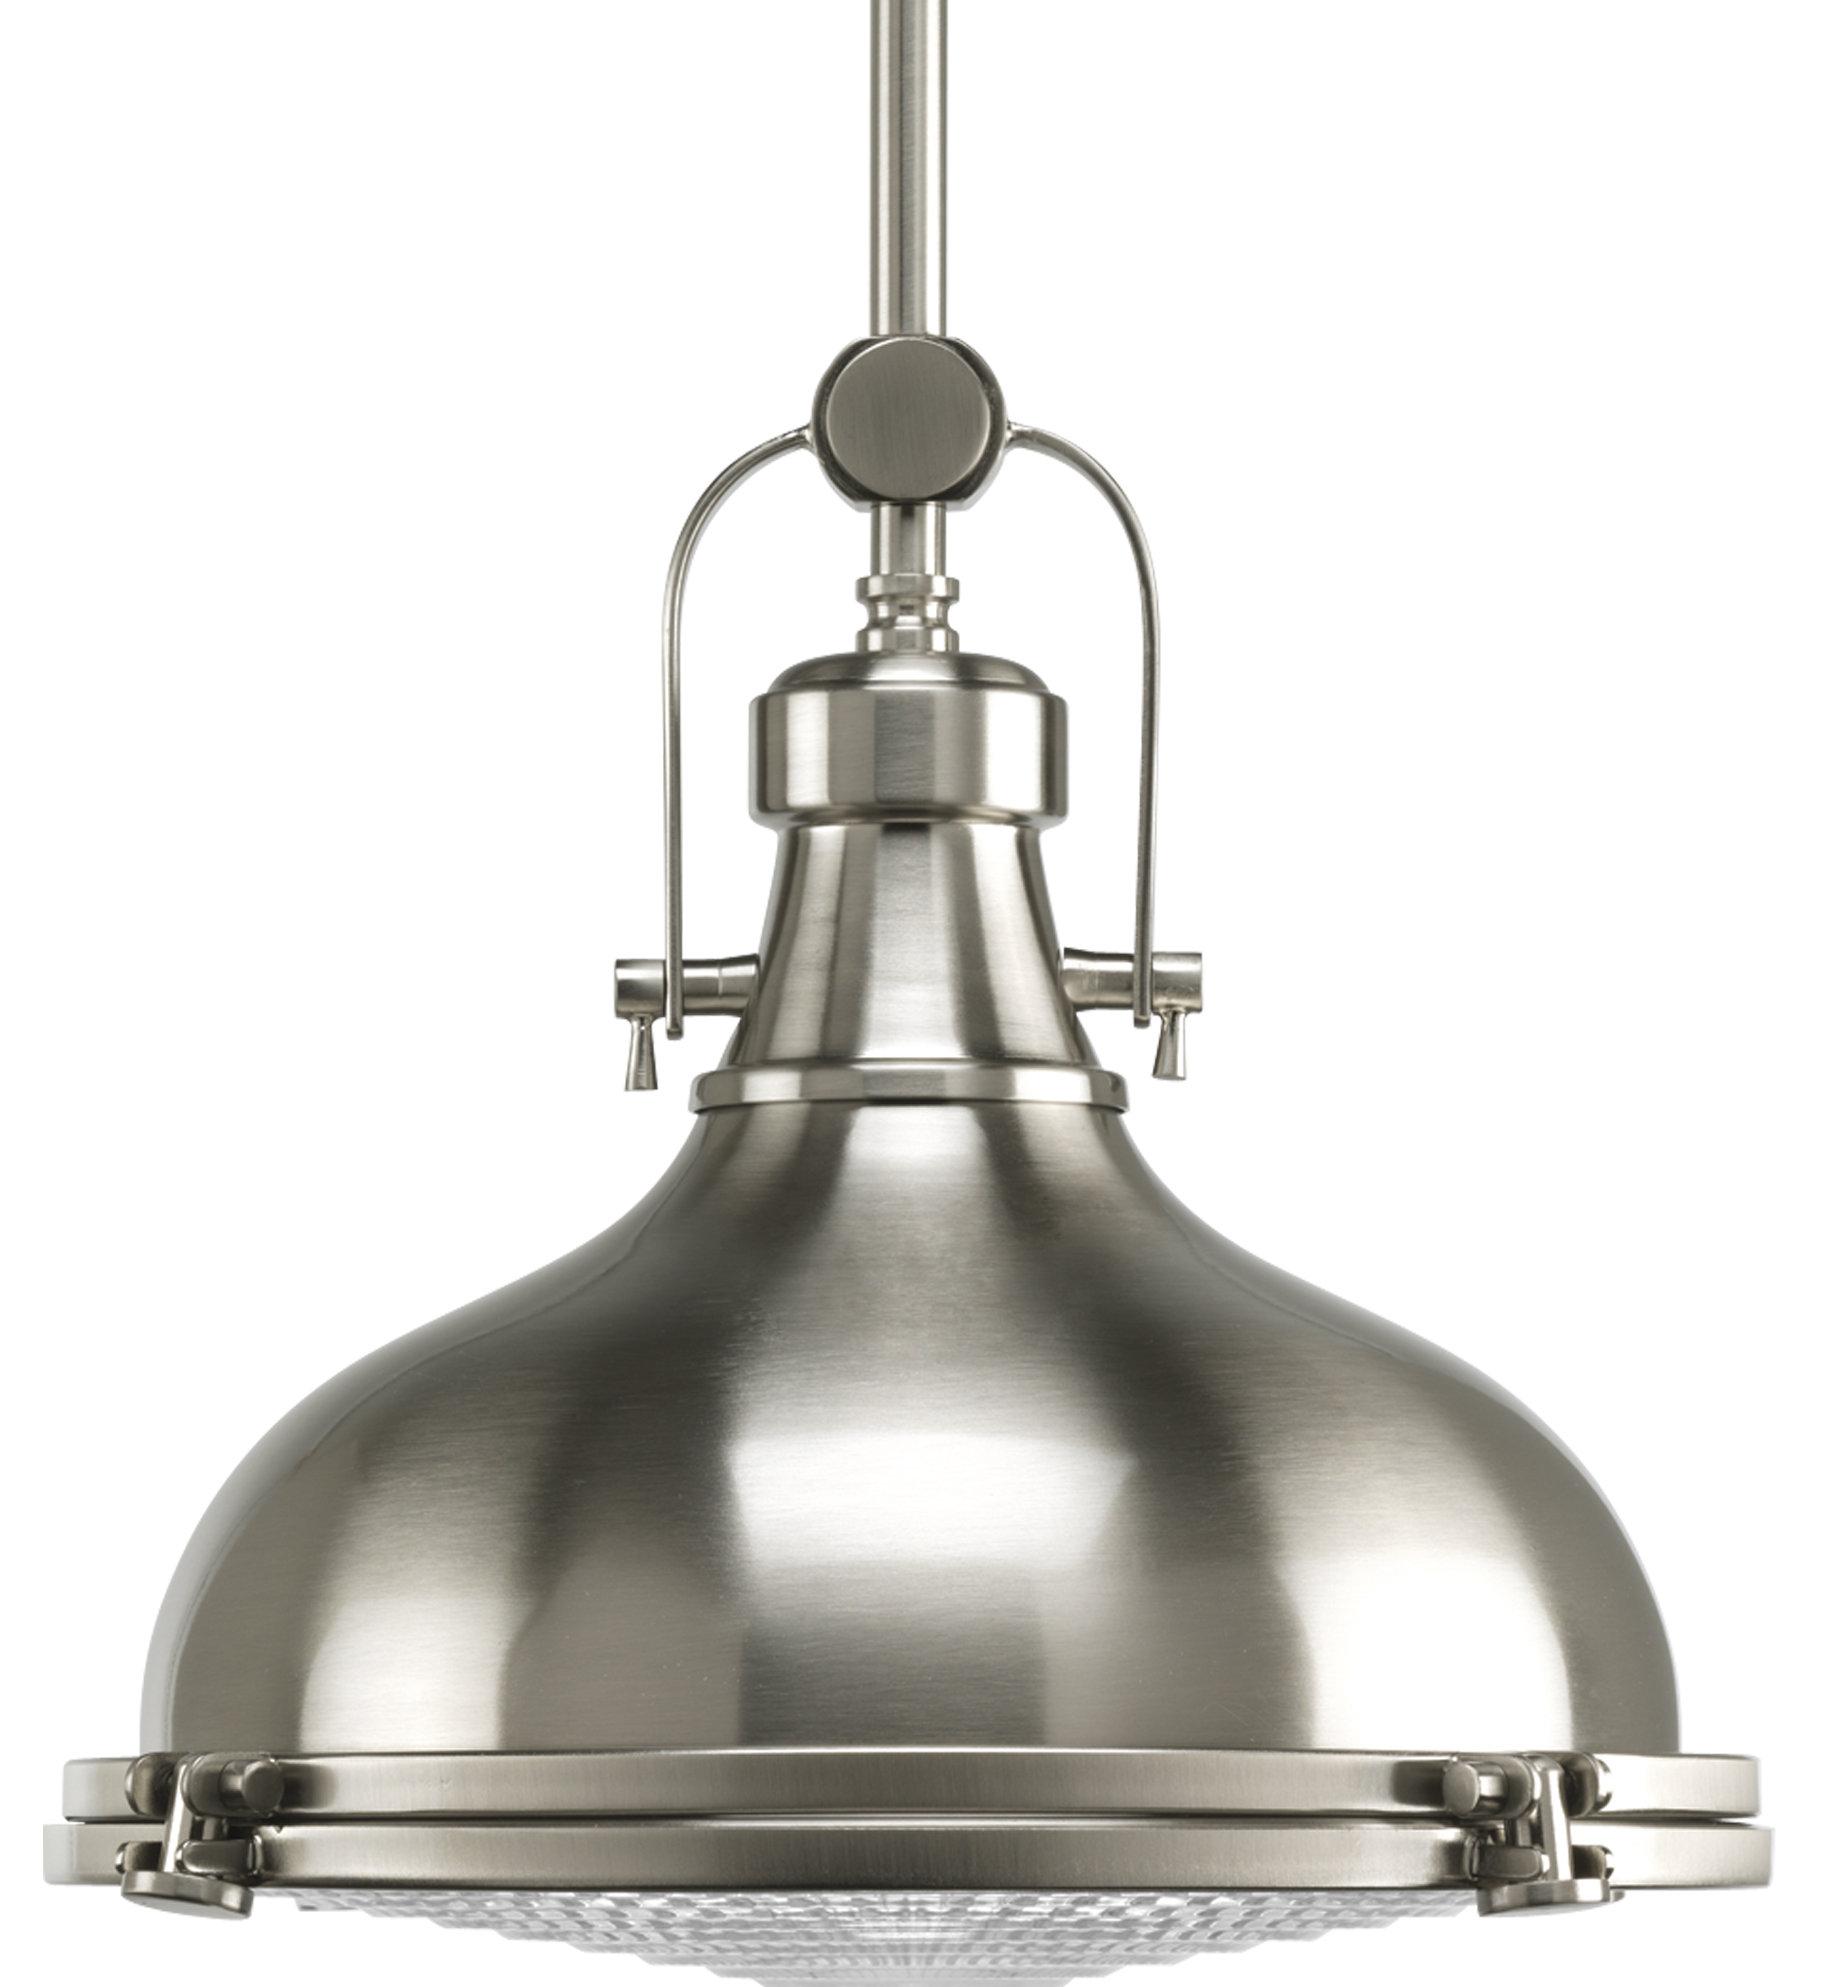 Freeda 1 Light Single Dome Pendant With Regard To Mueller 1 Light Single Dome Pendants (View 13 of 30)